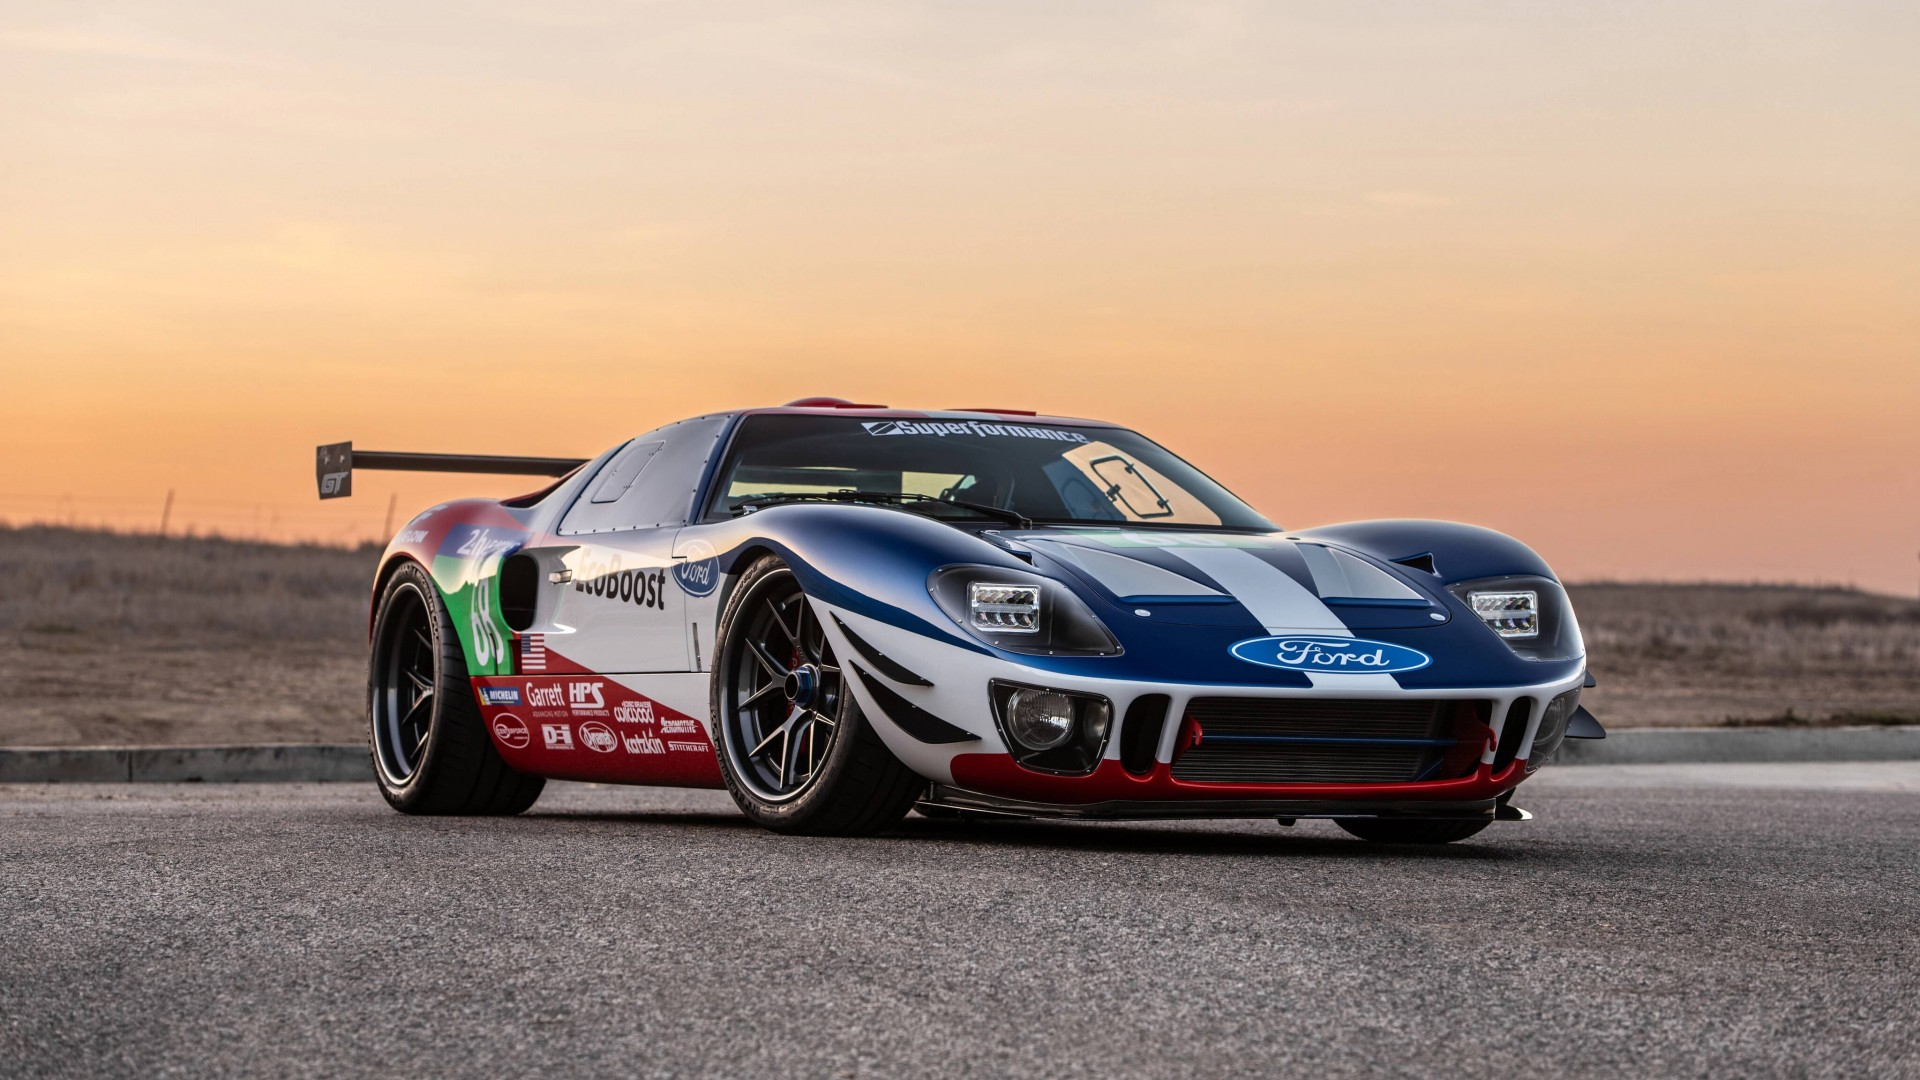 2019 Superformance Future Ford GT40 4K Wallpaper   HD Car ...